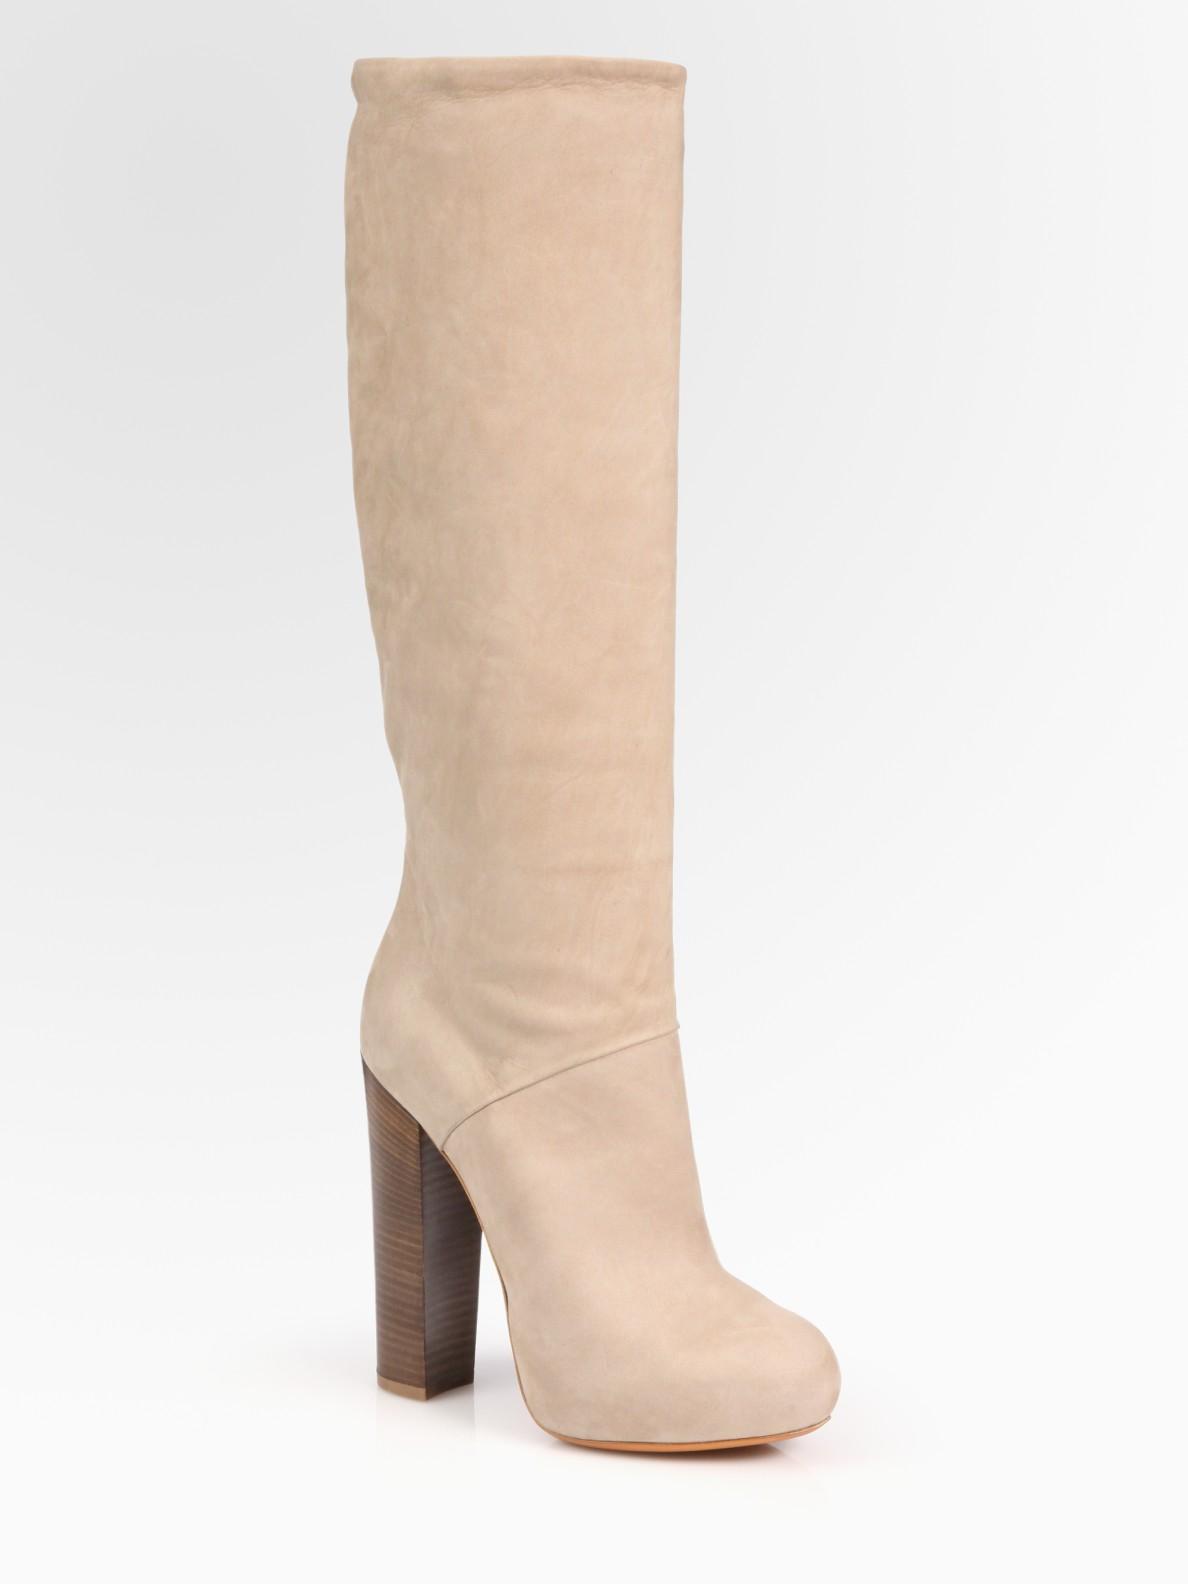 B Brian Atwood Pheonicia Nubuck Leather Knee High Platform